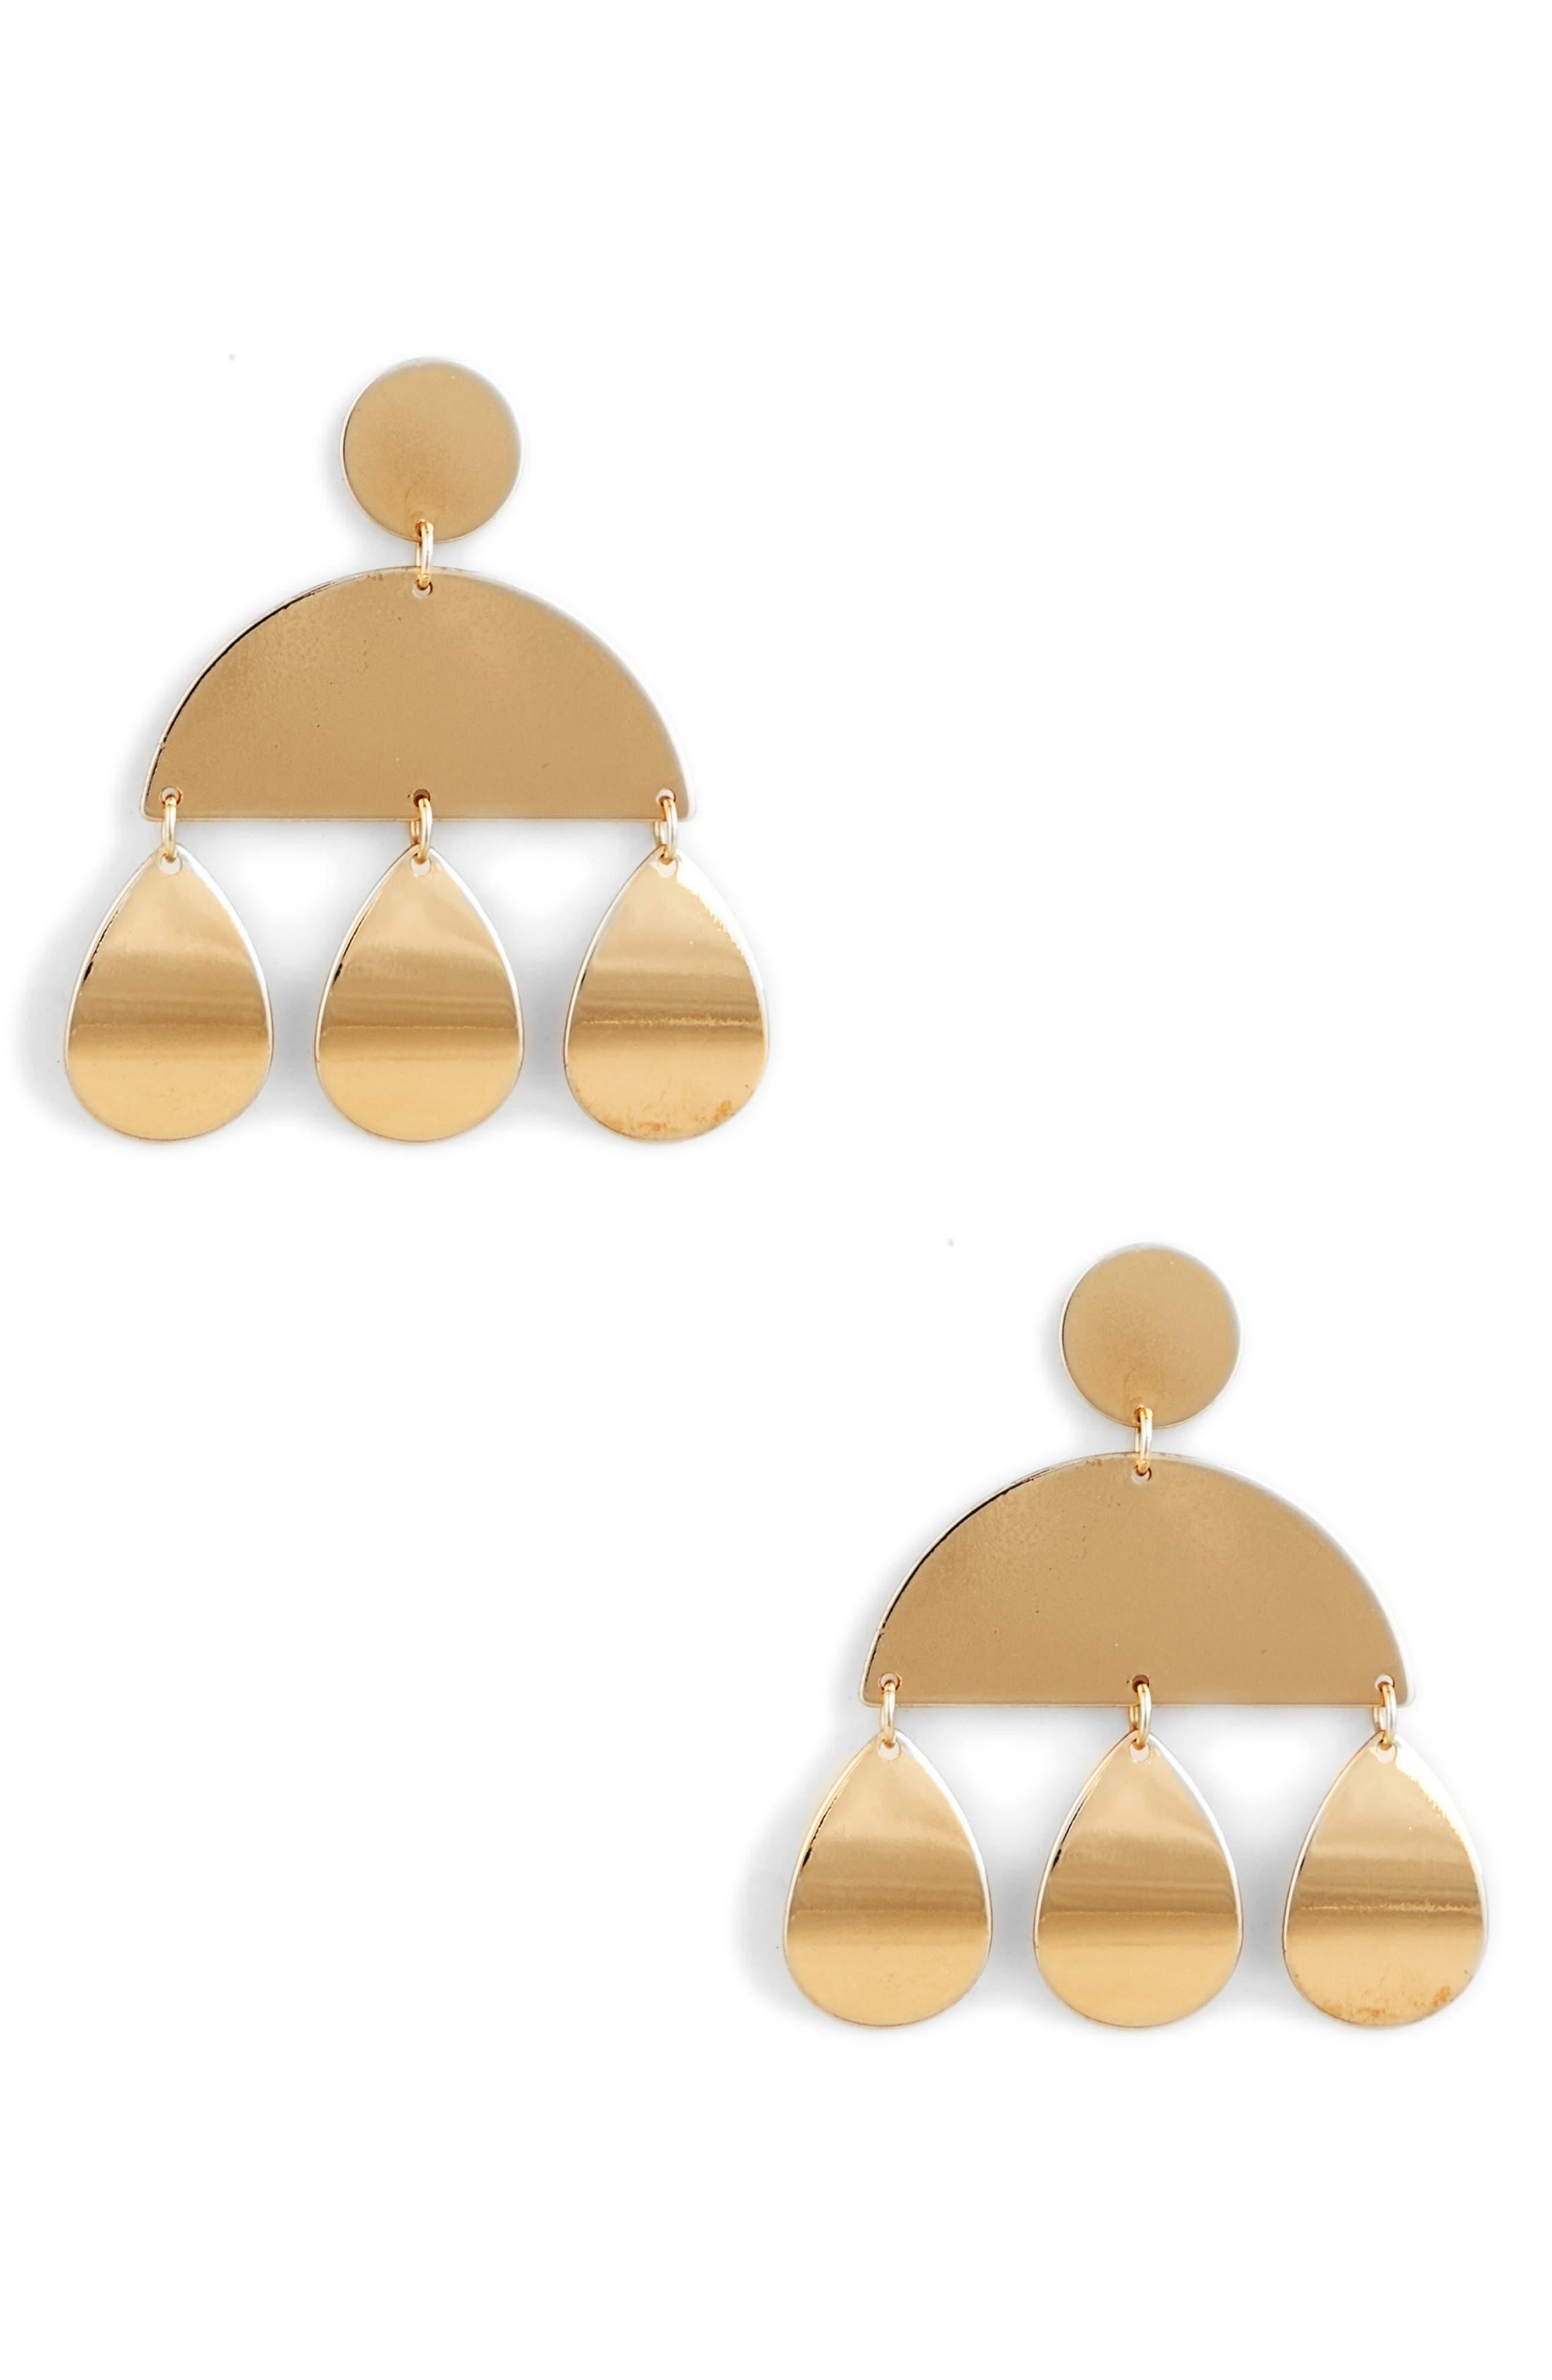 Geometric Plate Earrings,                             Main thumbnail 1, color,                             710